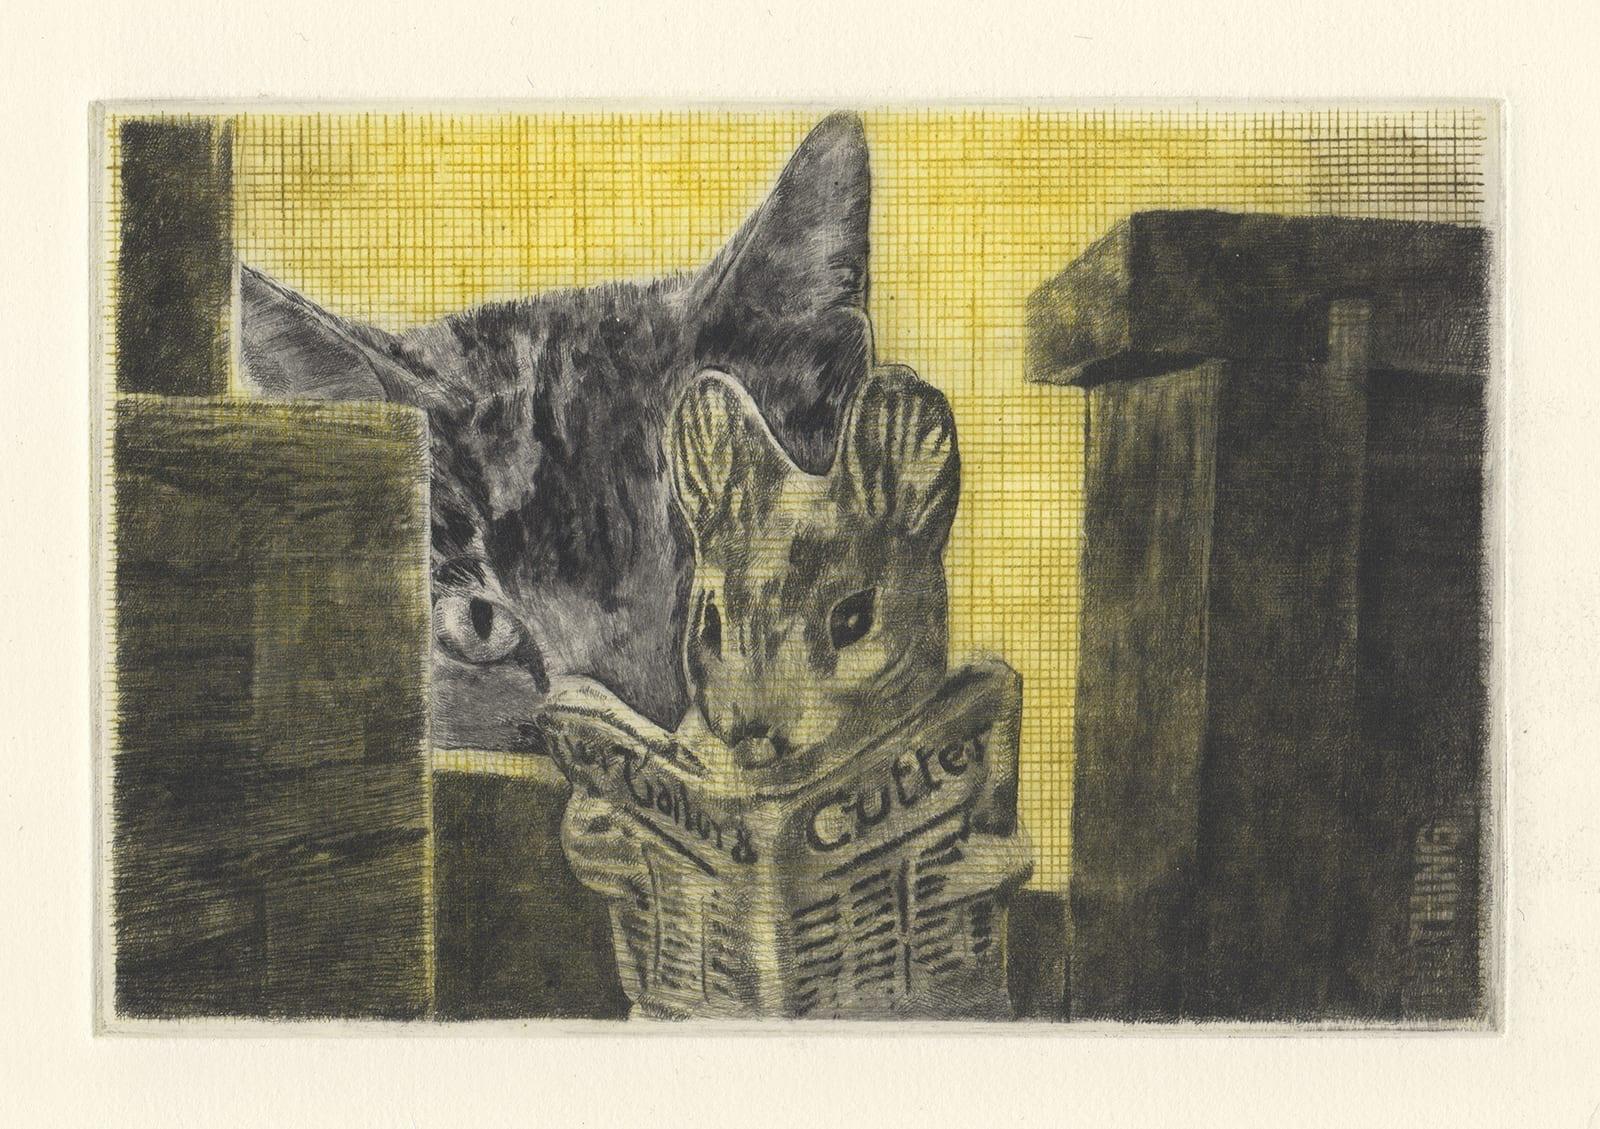 Kyoku (drypoint etching by Yaemi Shigyo)